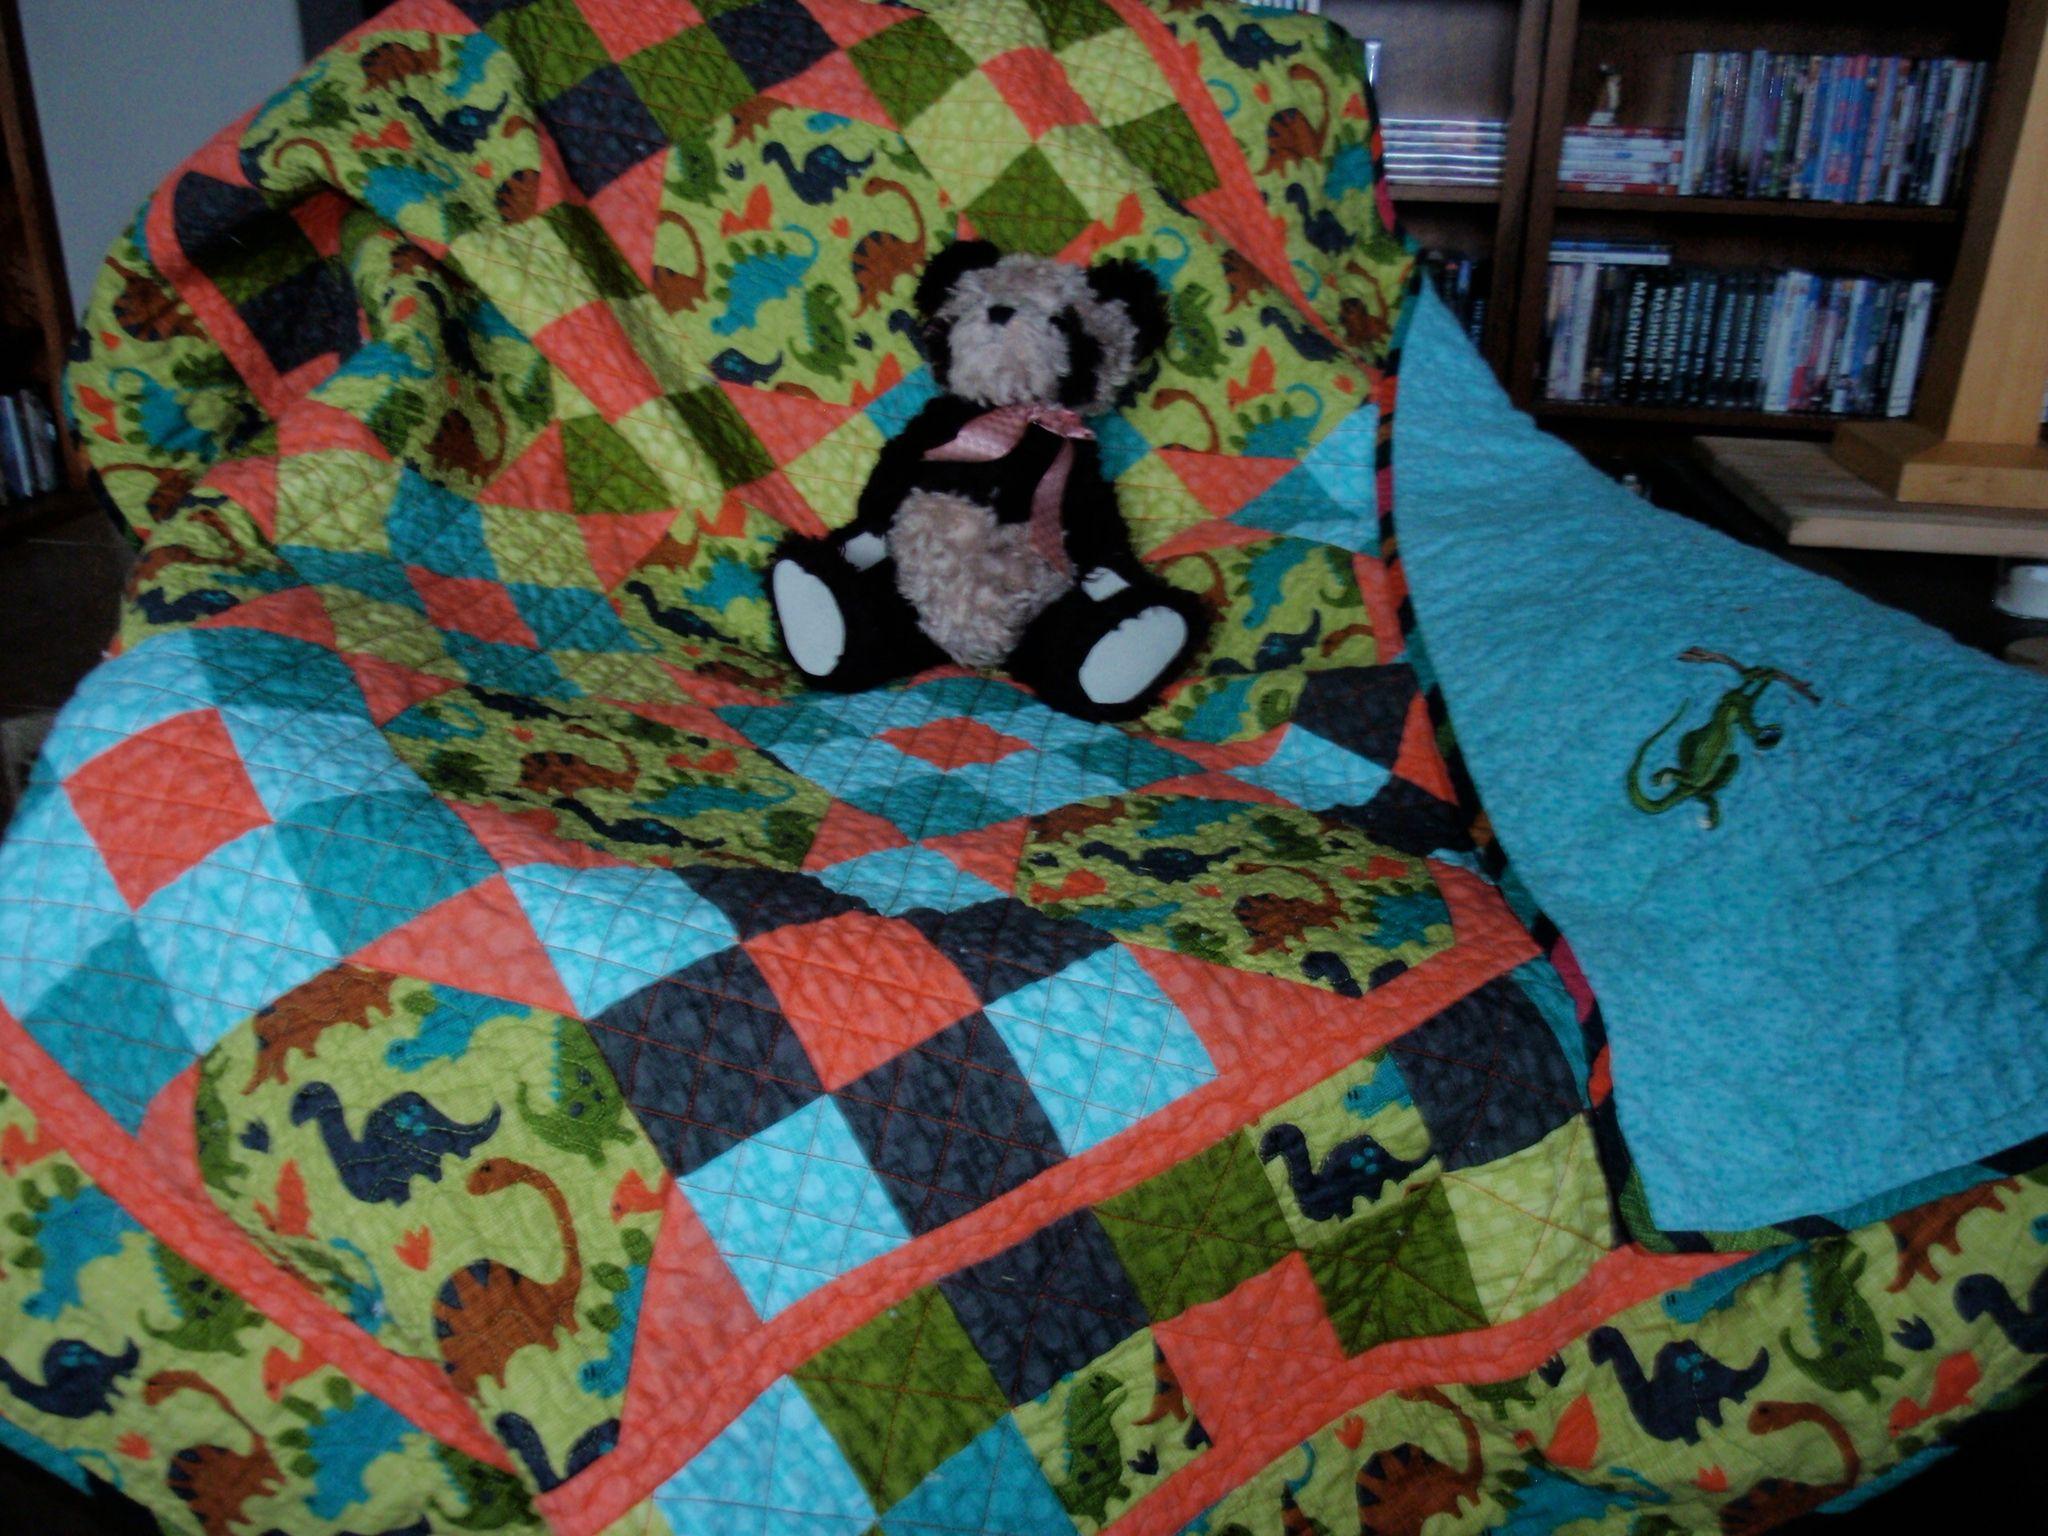 By kbassi - Dinosaur quilt done in Delaware blocks; flannel back.